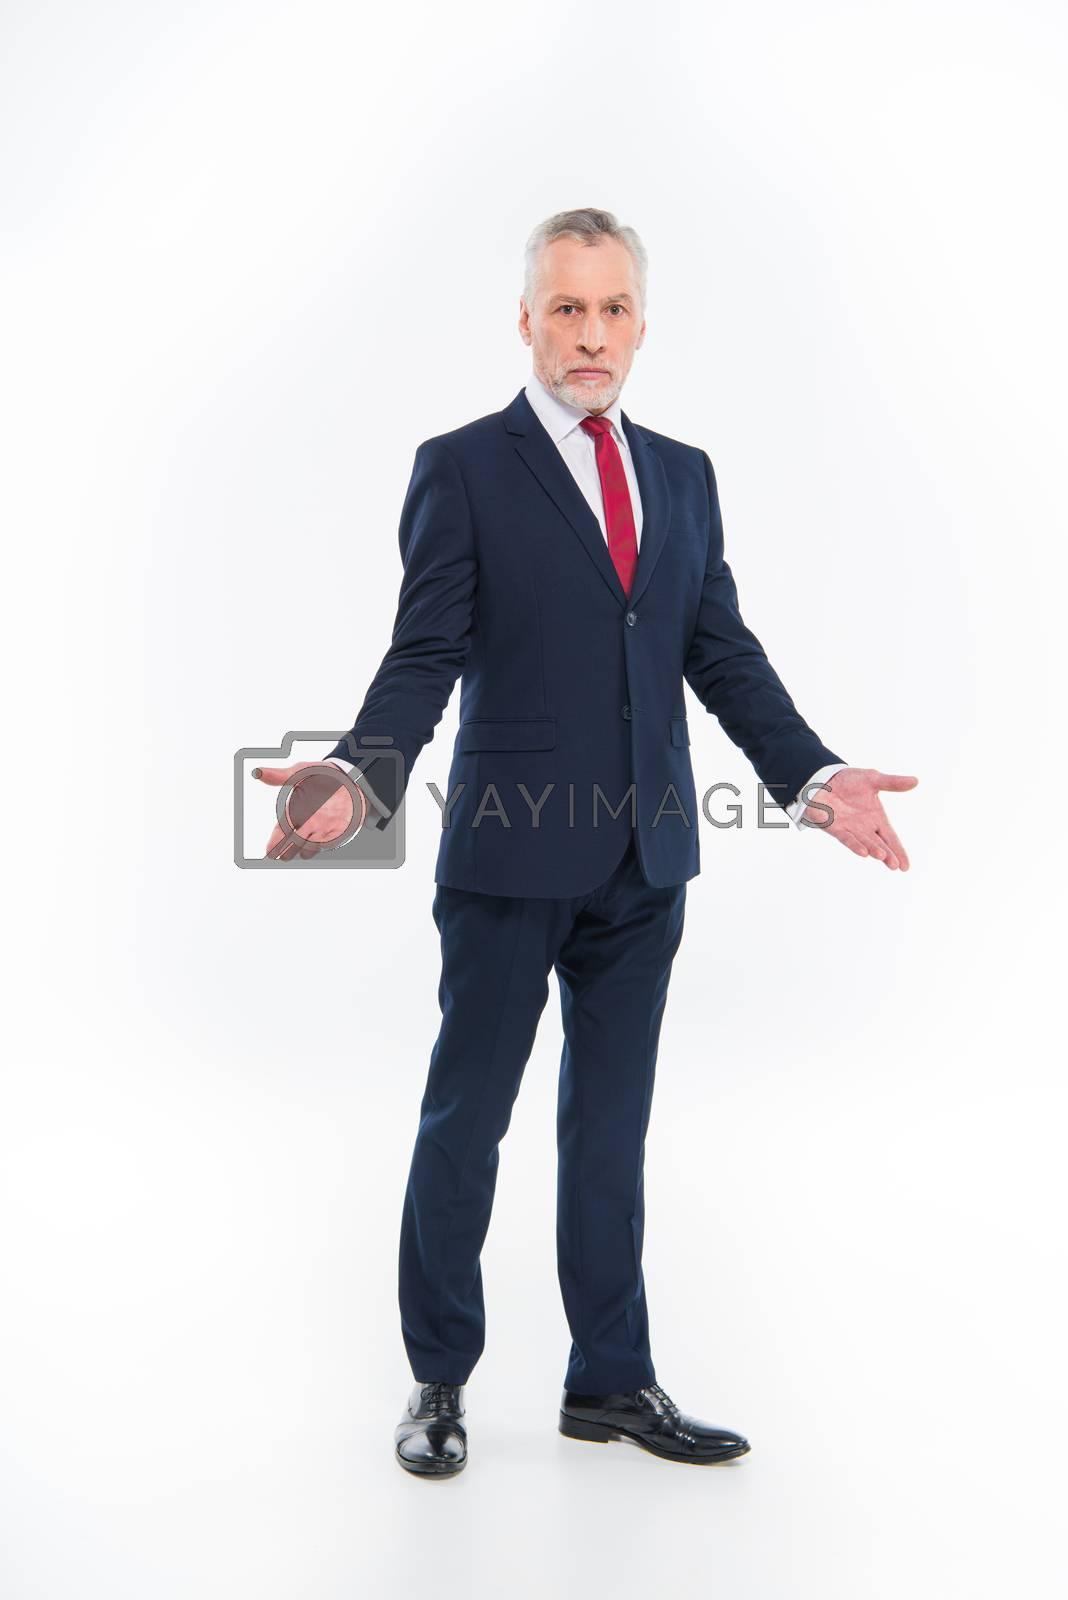 Confused mature businessman by LightFieldStudios